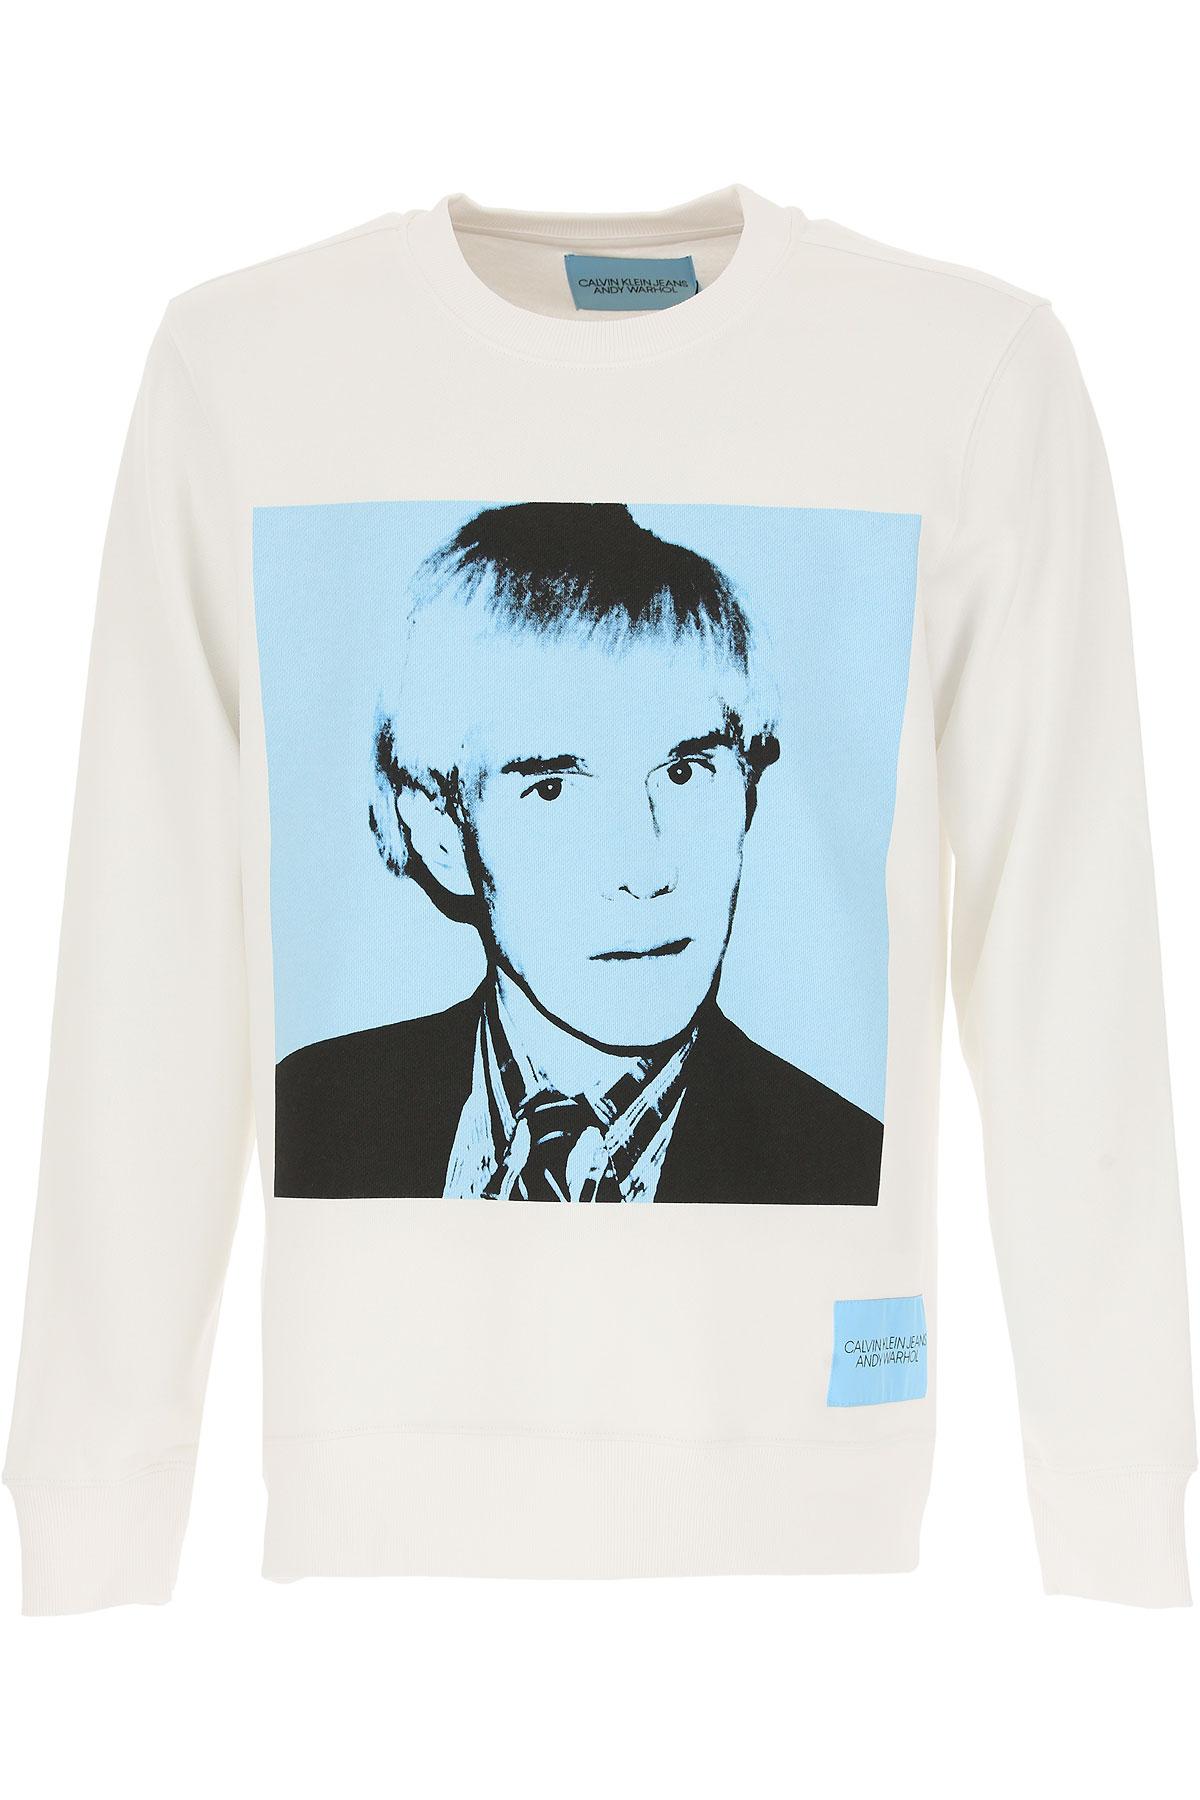 Calvin Klein Sweatshirt for Men, White, Cotton, 2017, L M S XL USA-467174